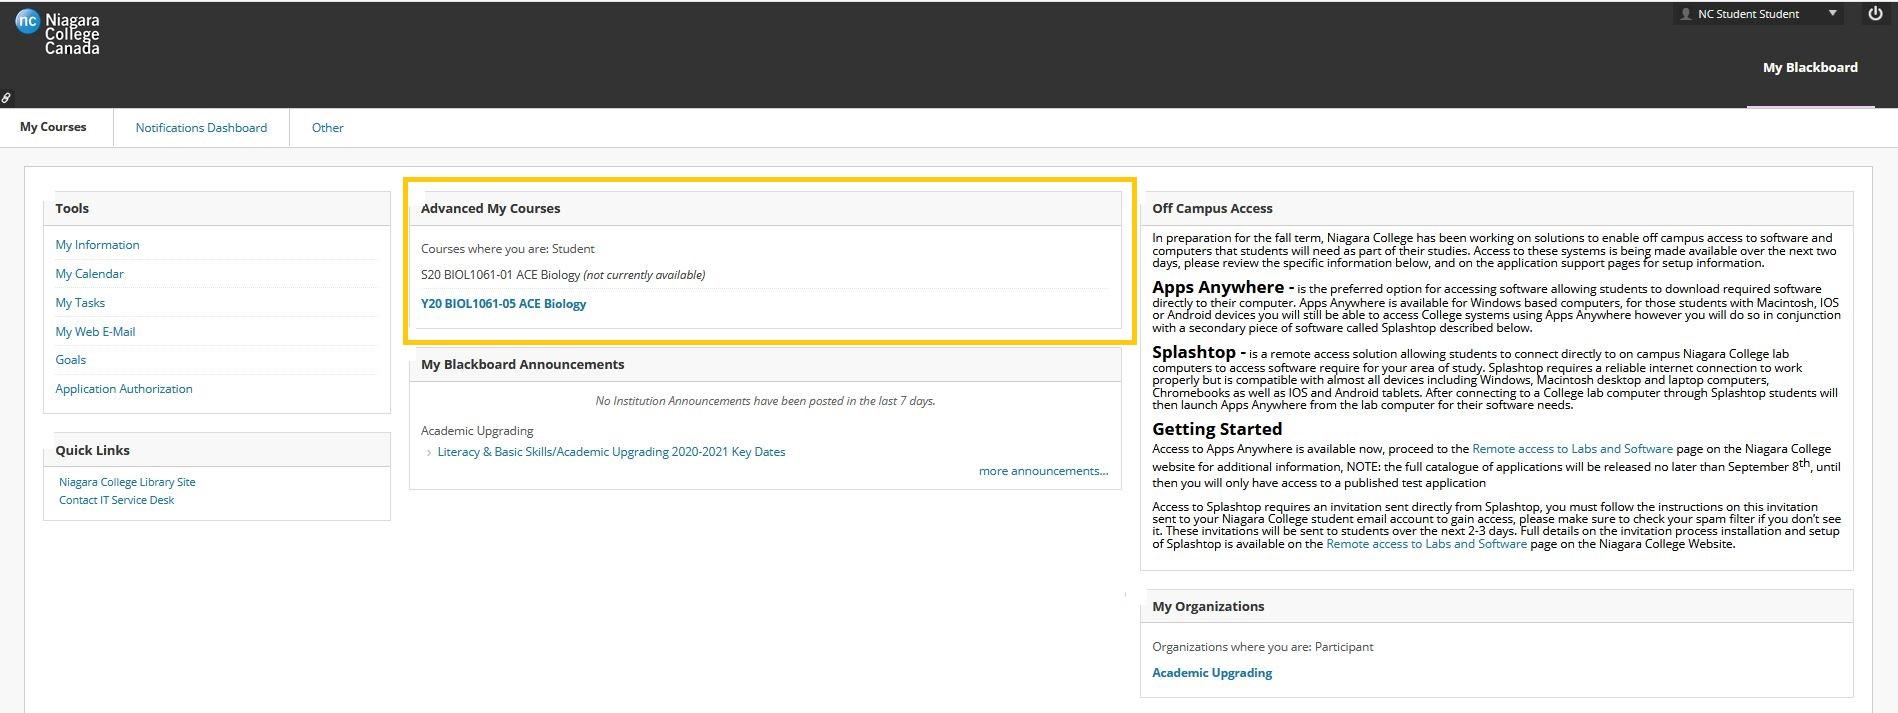 Screenshot of Blackboard Advanced My Courses landing page